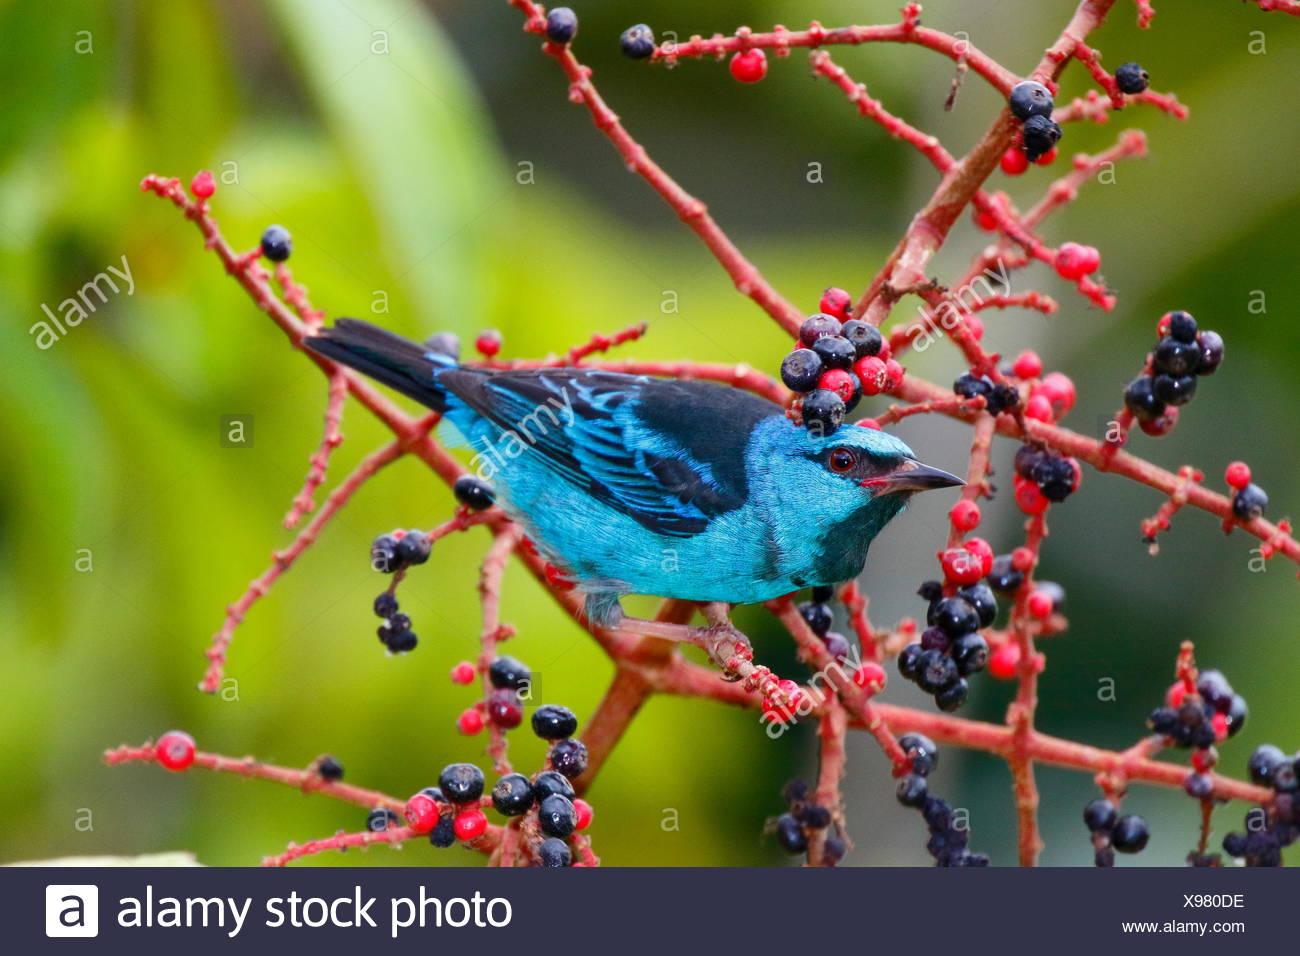 Dacnis bleu ou turquoise, Dacnis cayana honeycreeper, qui se nourrissent de fruits melastome. Photo Stock